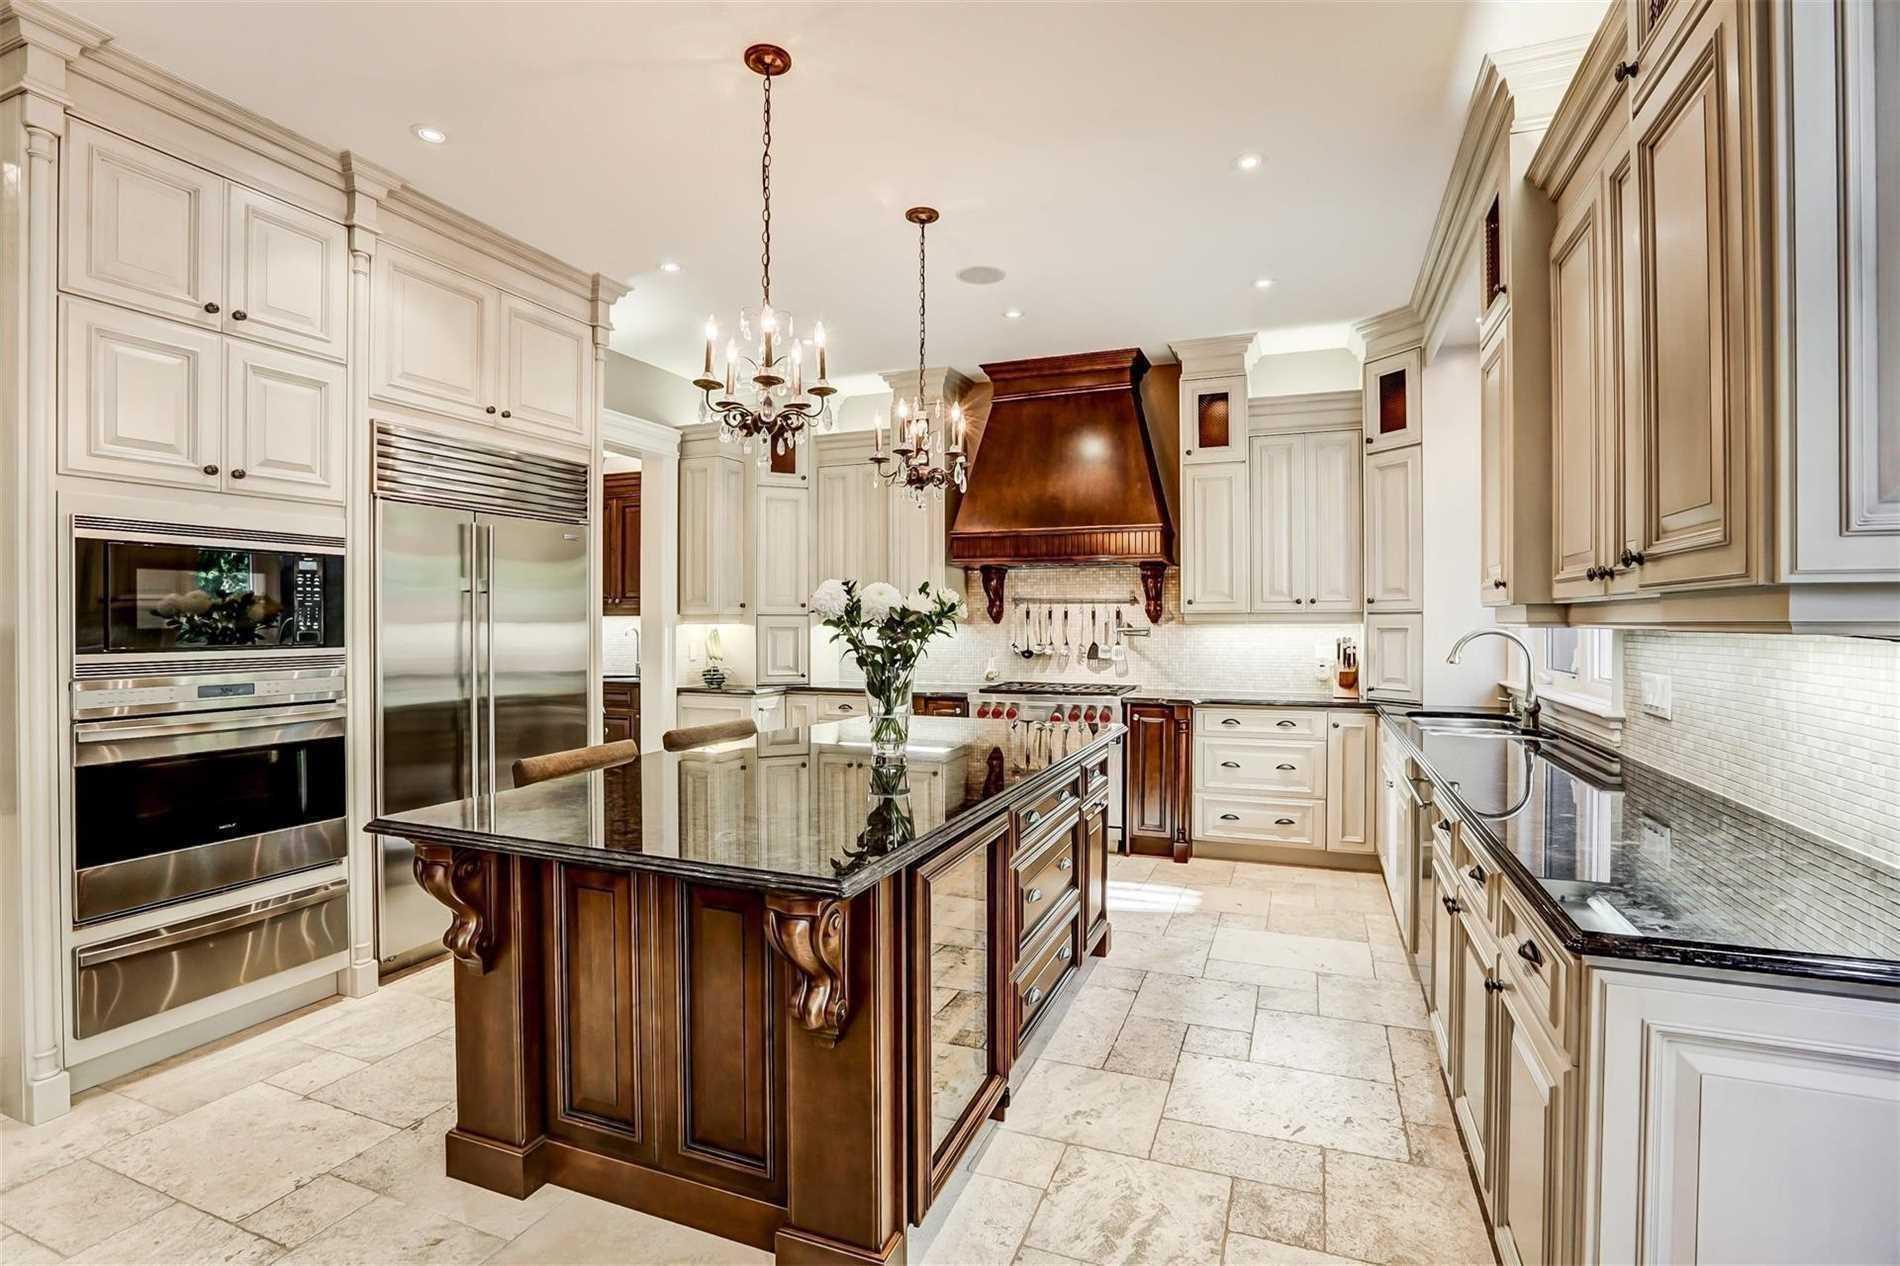 1577 Glenburnie Rd, Mississauga W4583227